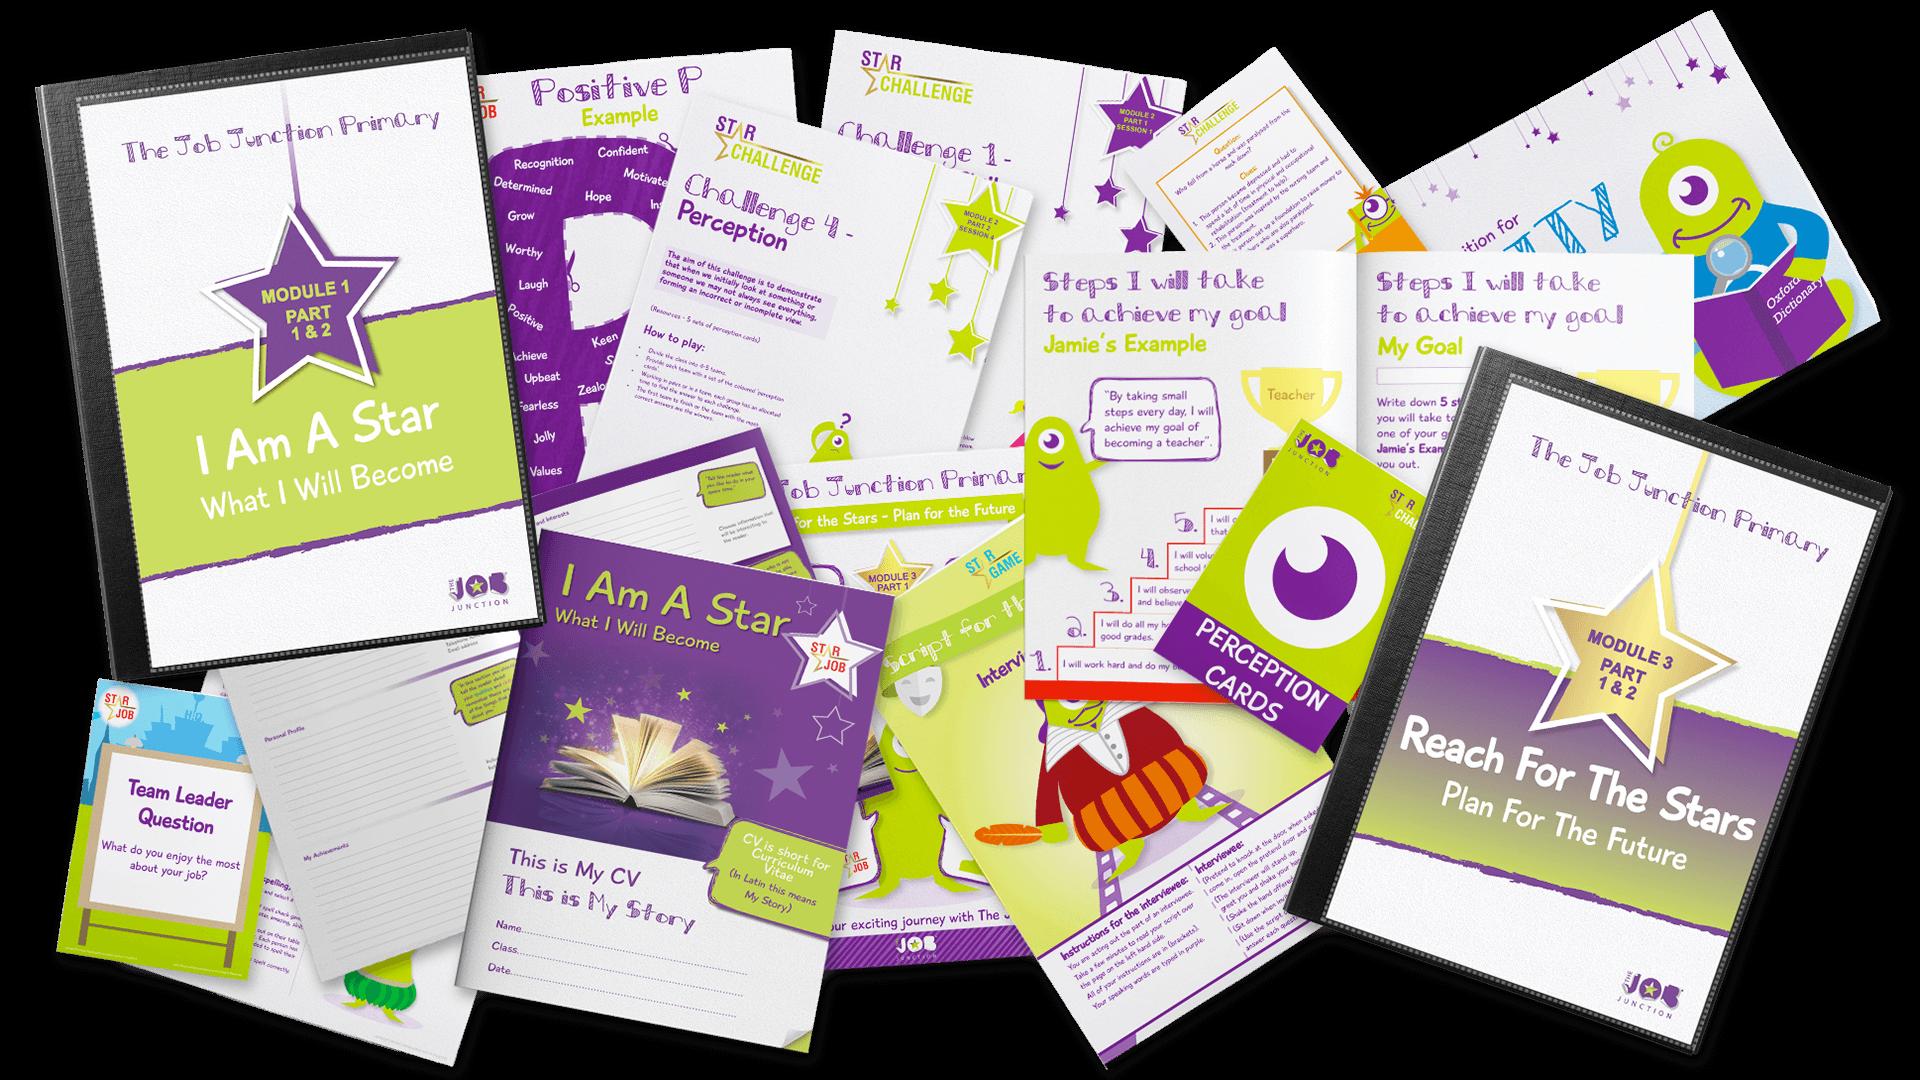 The Raising Aspirations programme materials